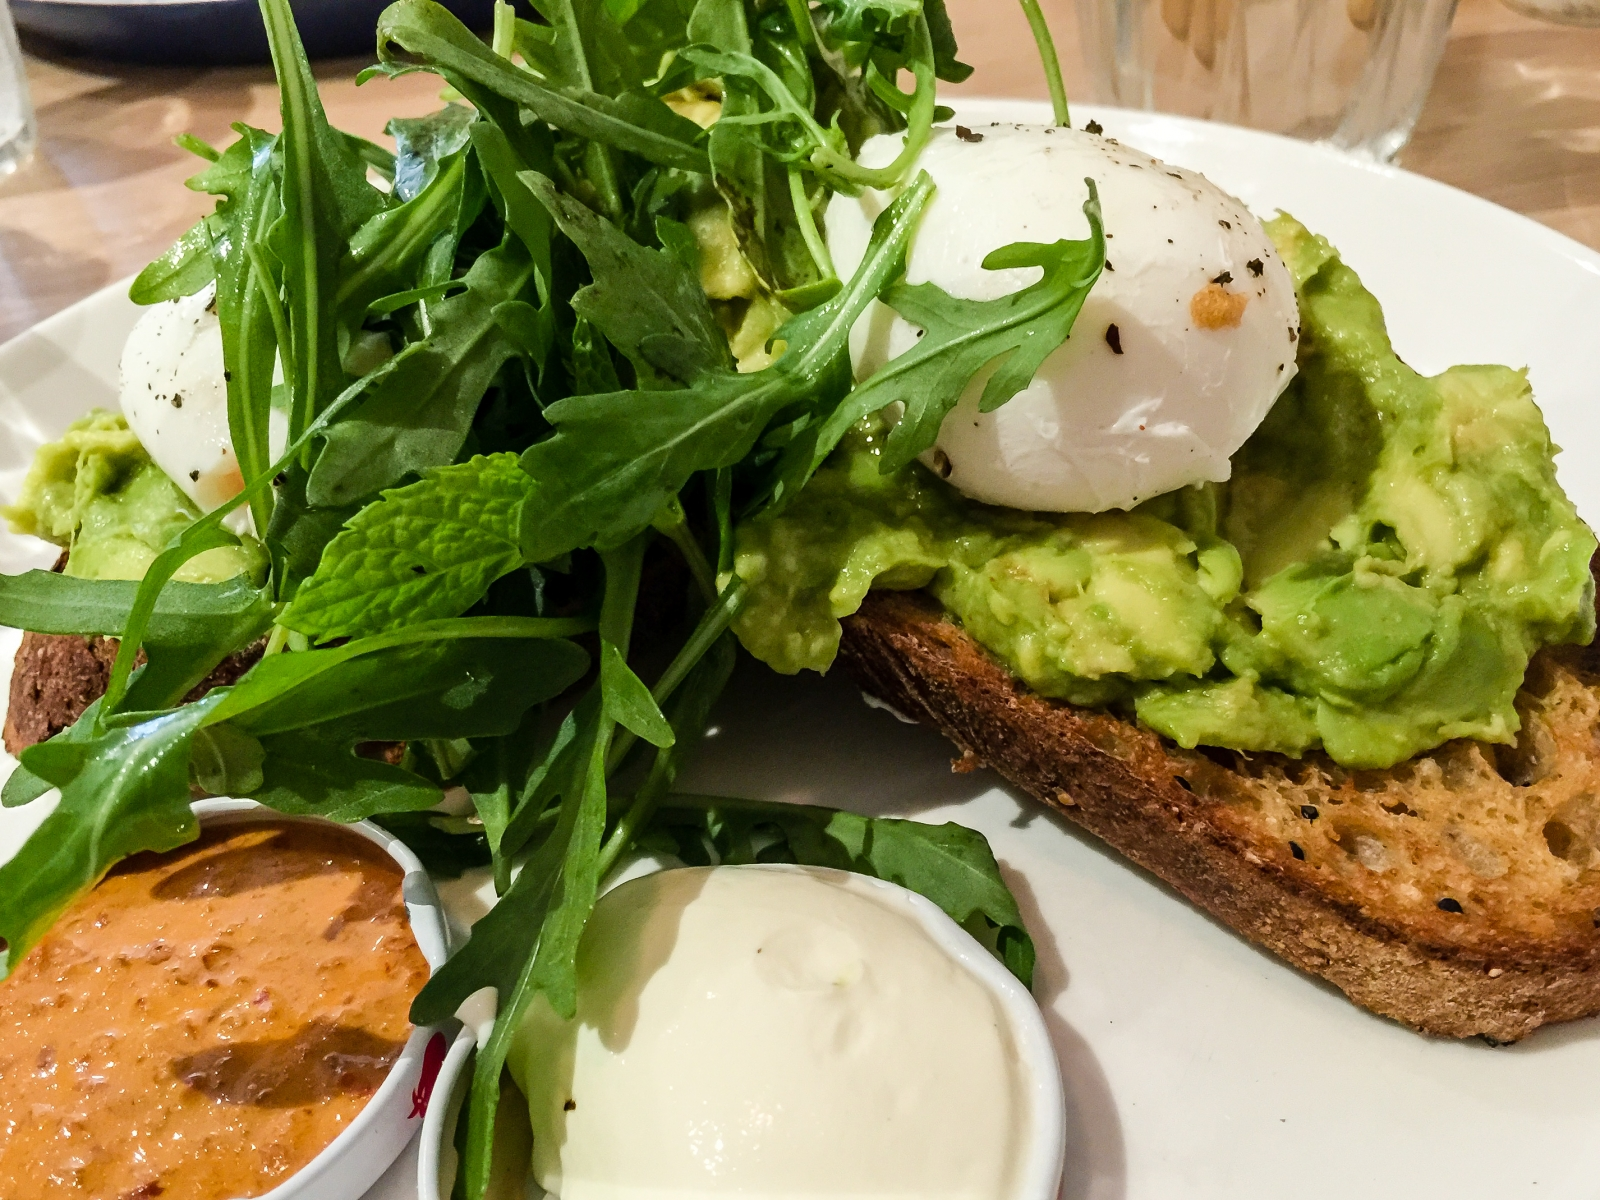 Eggs and avocado on toast